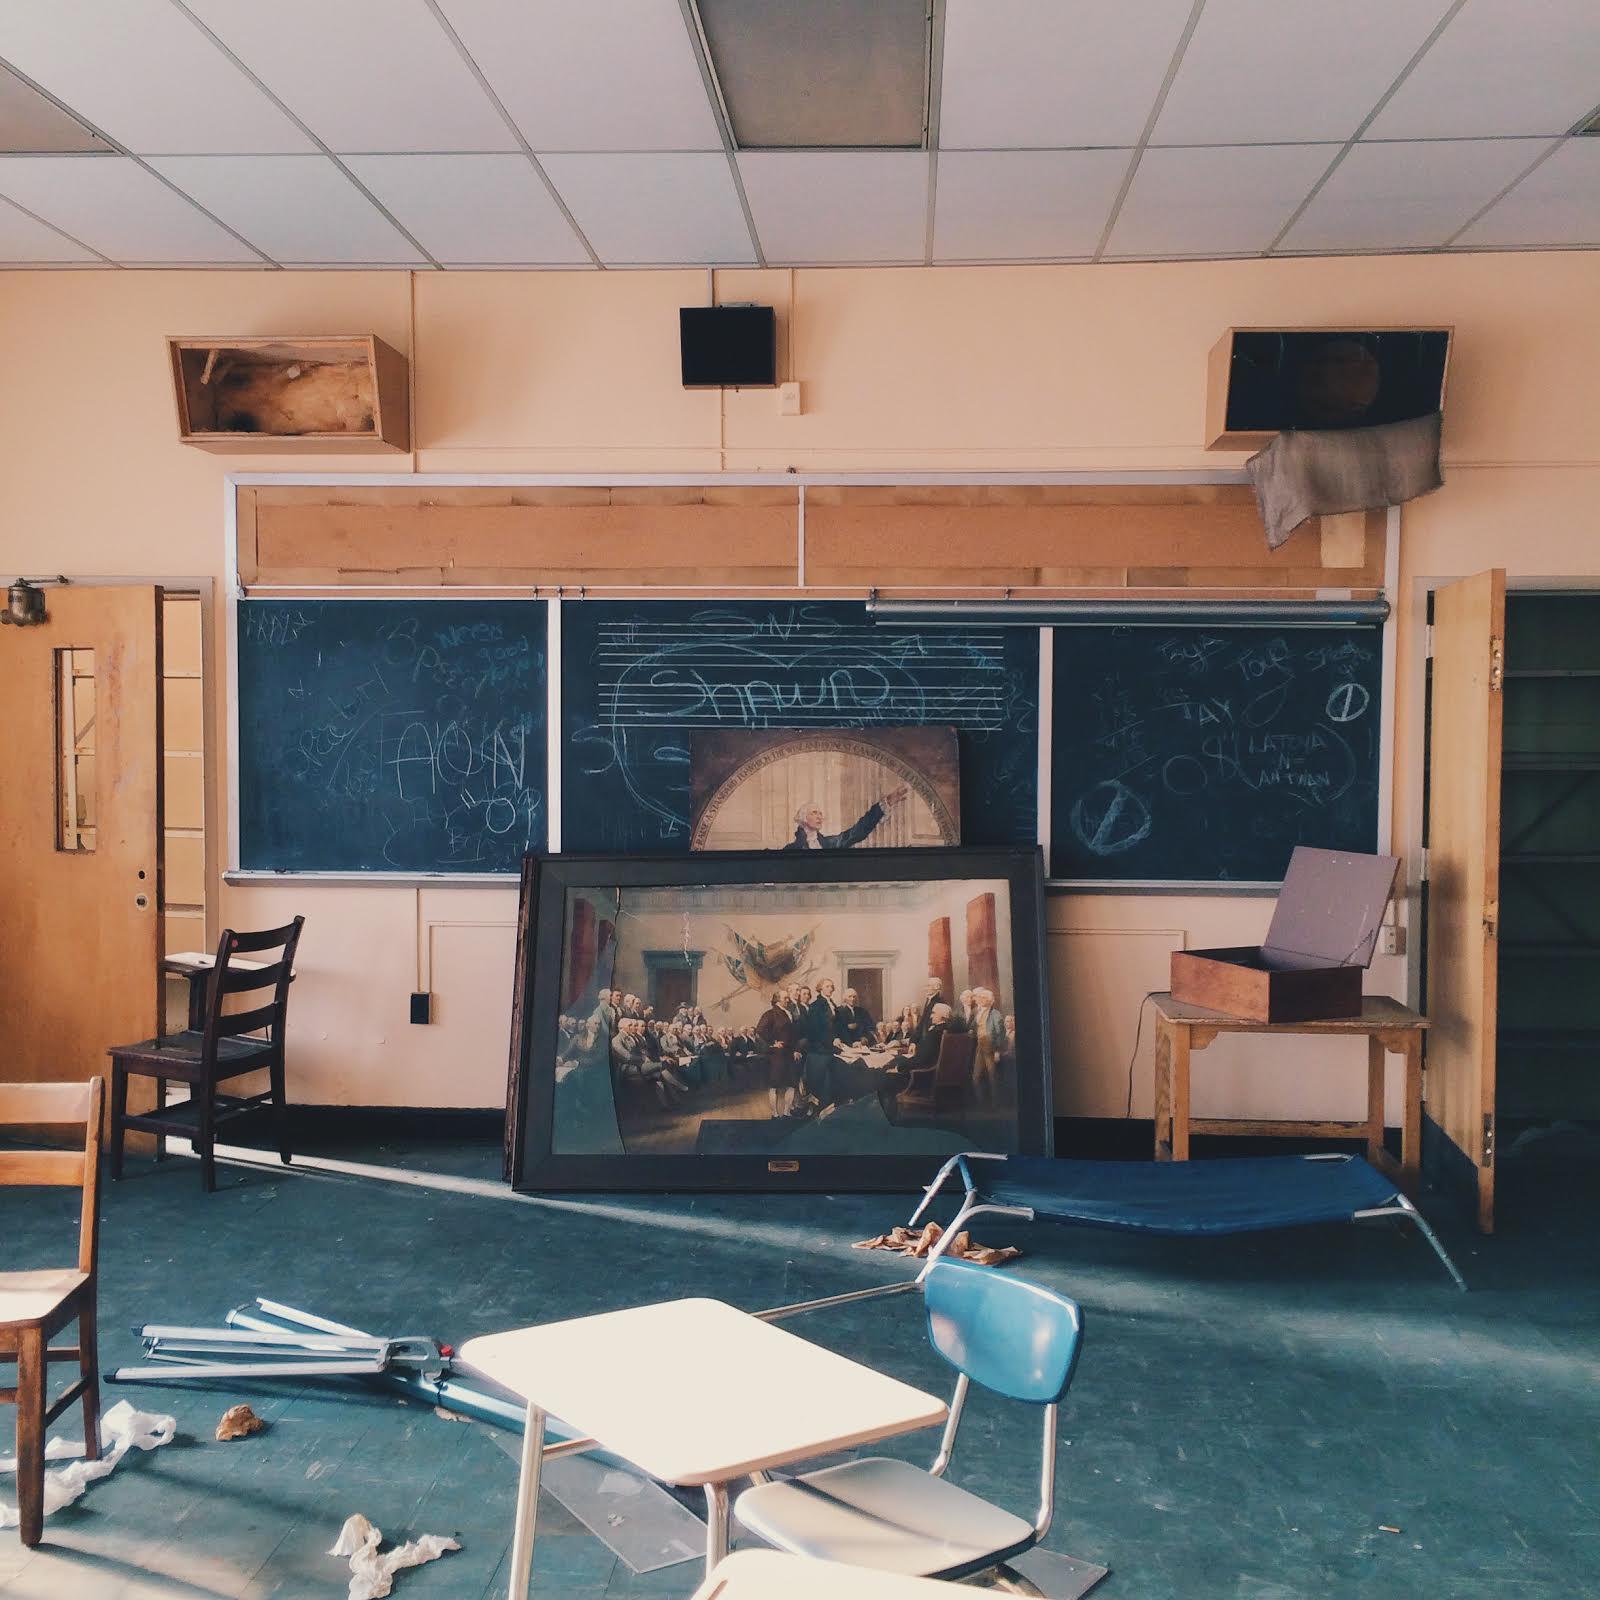 Exploring The Ruins of Philadelphia's Public School System